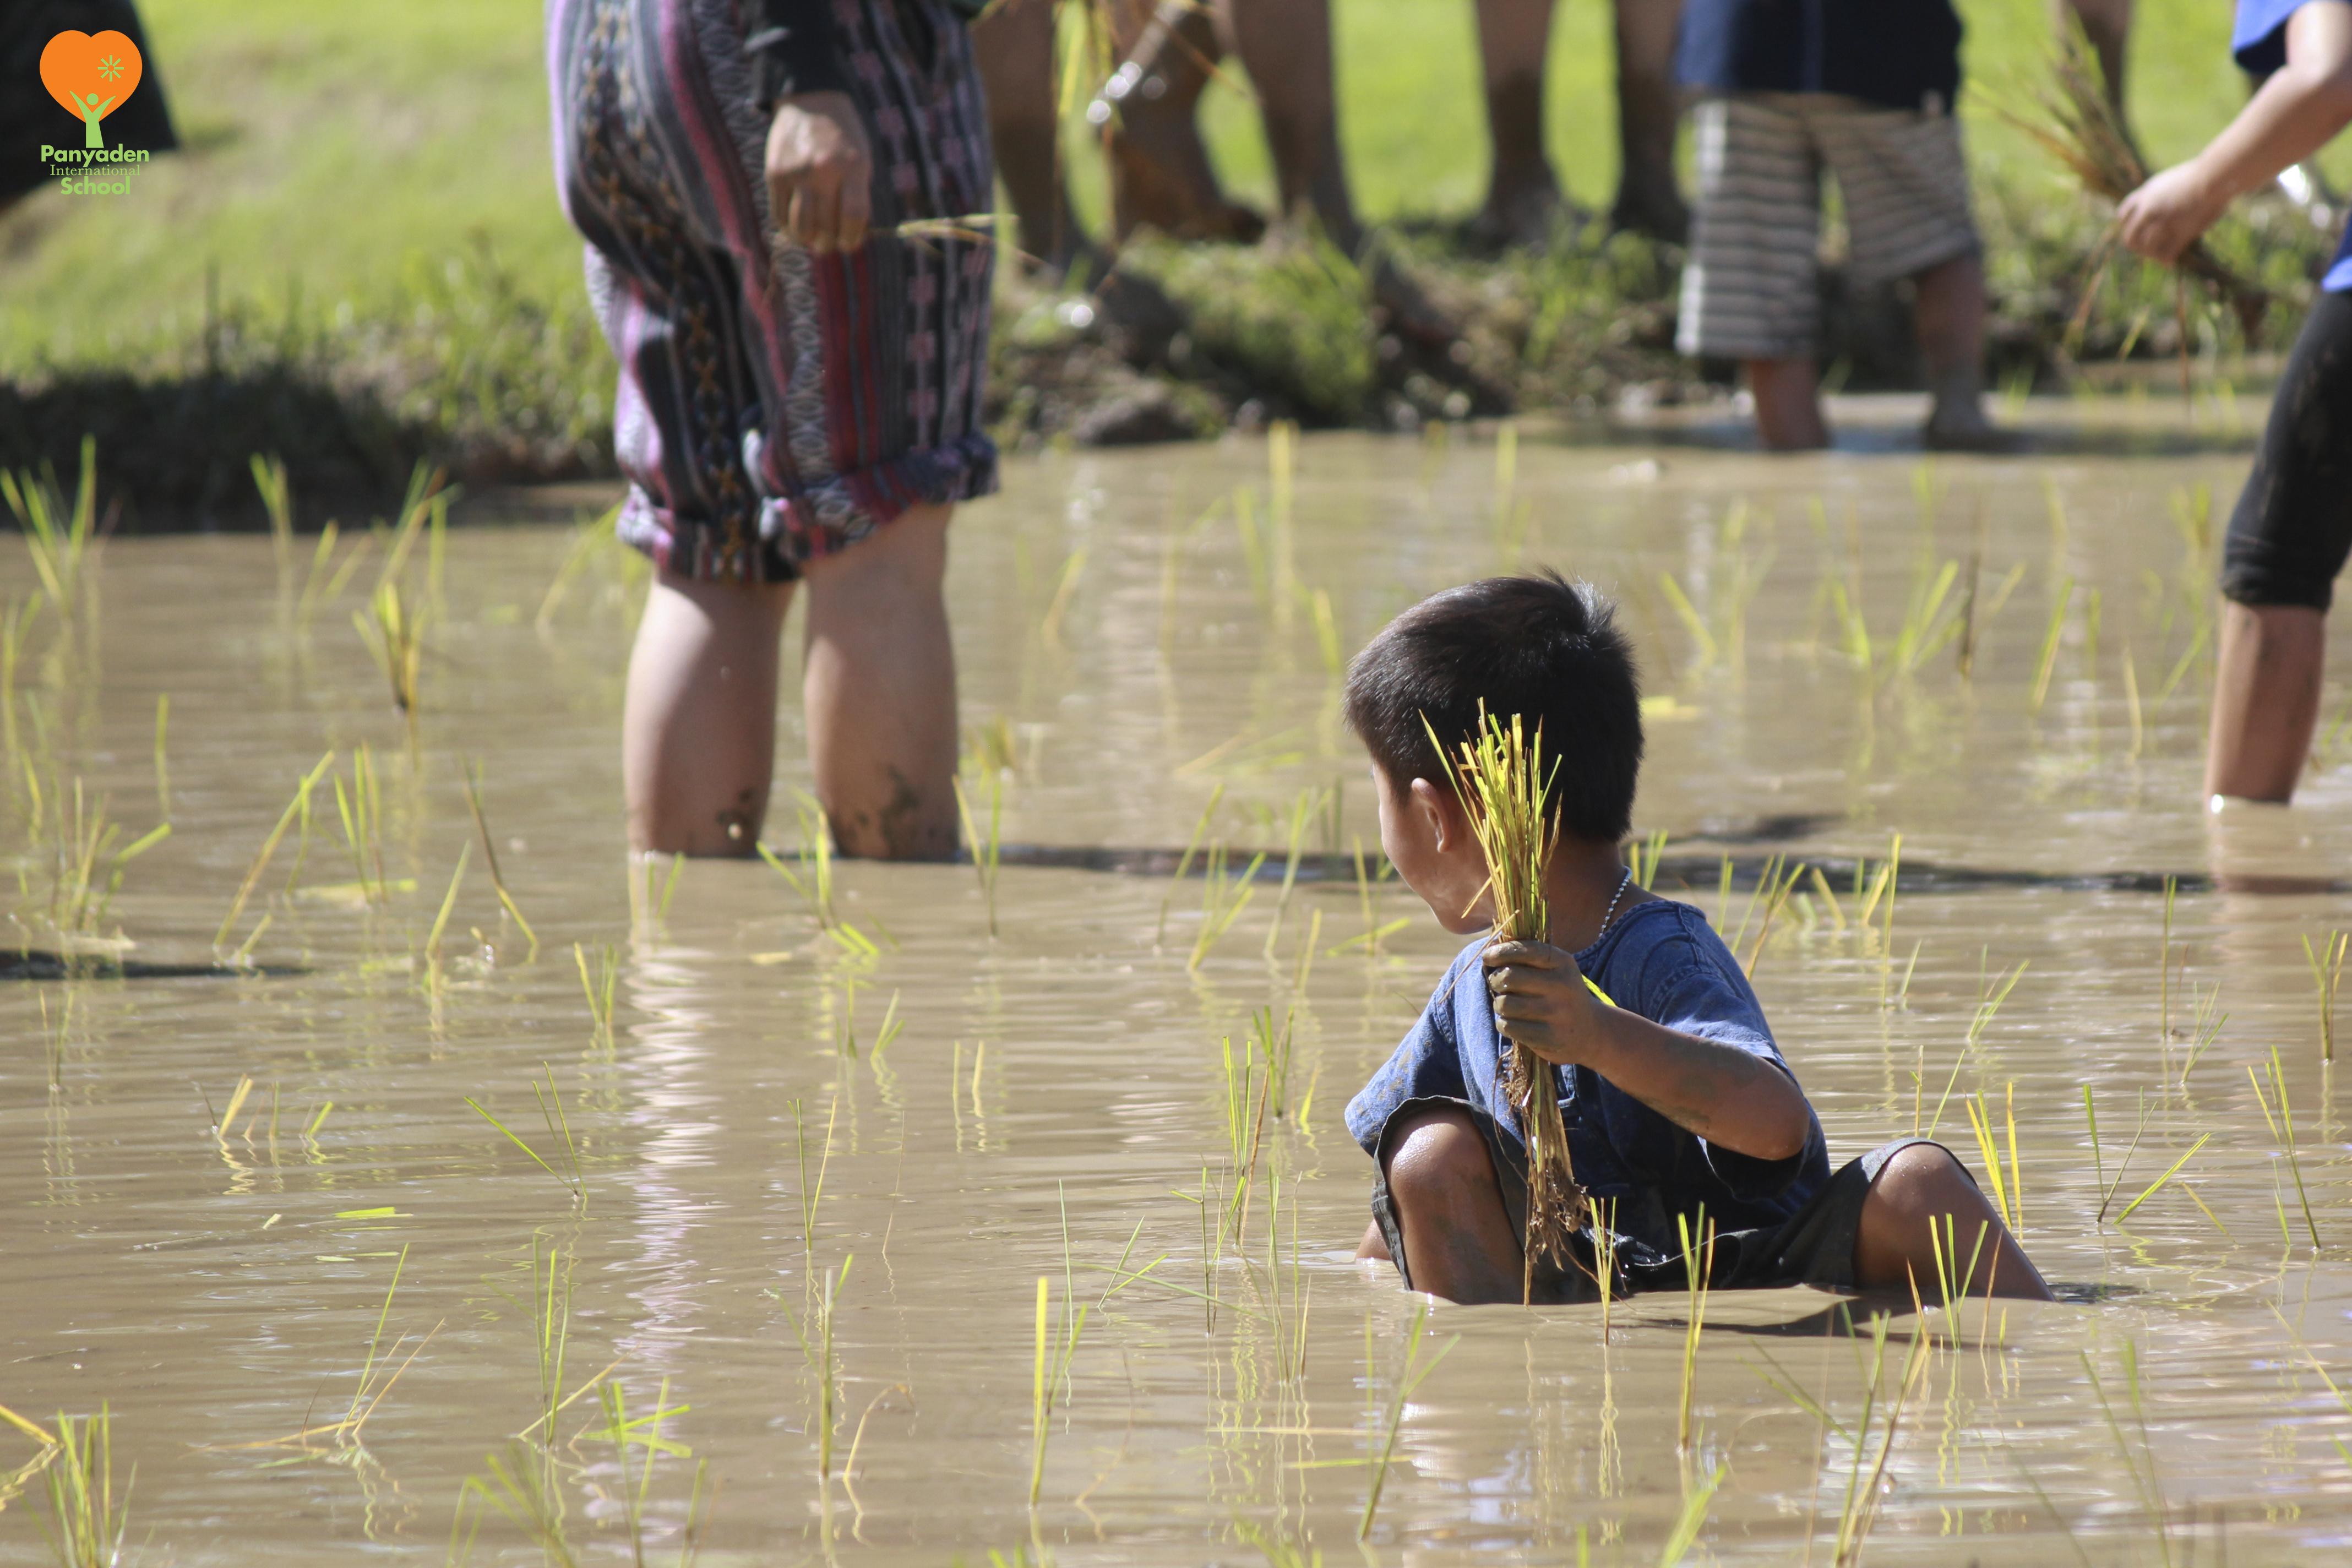 Immersed in mud! Rice planting at Panyaden International School